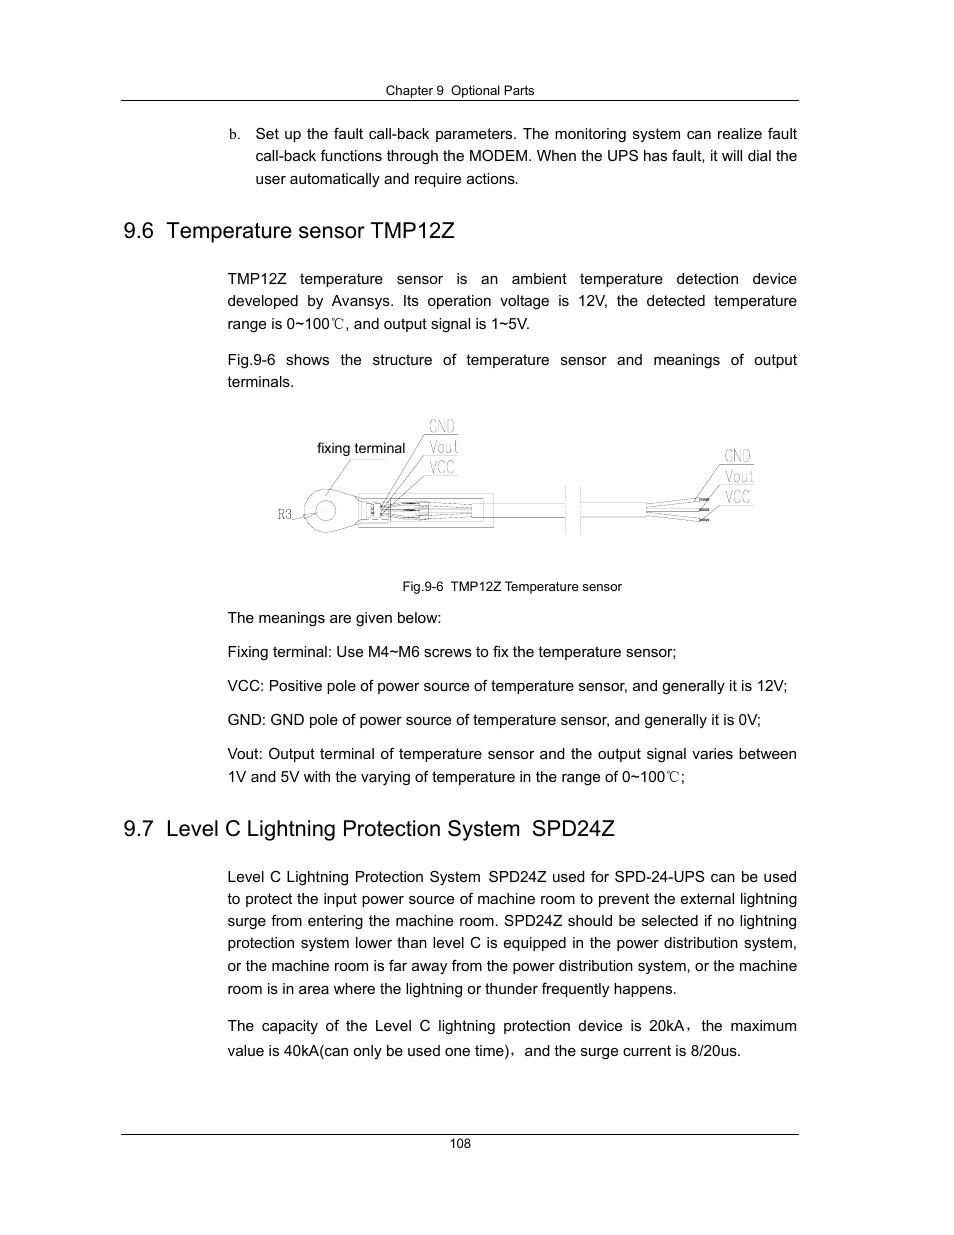 6 temperature sensor tmp12z, 7 level c lightning protection system